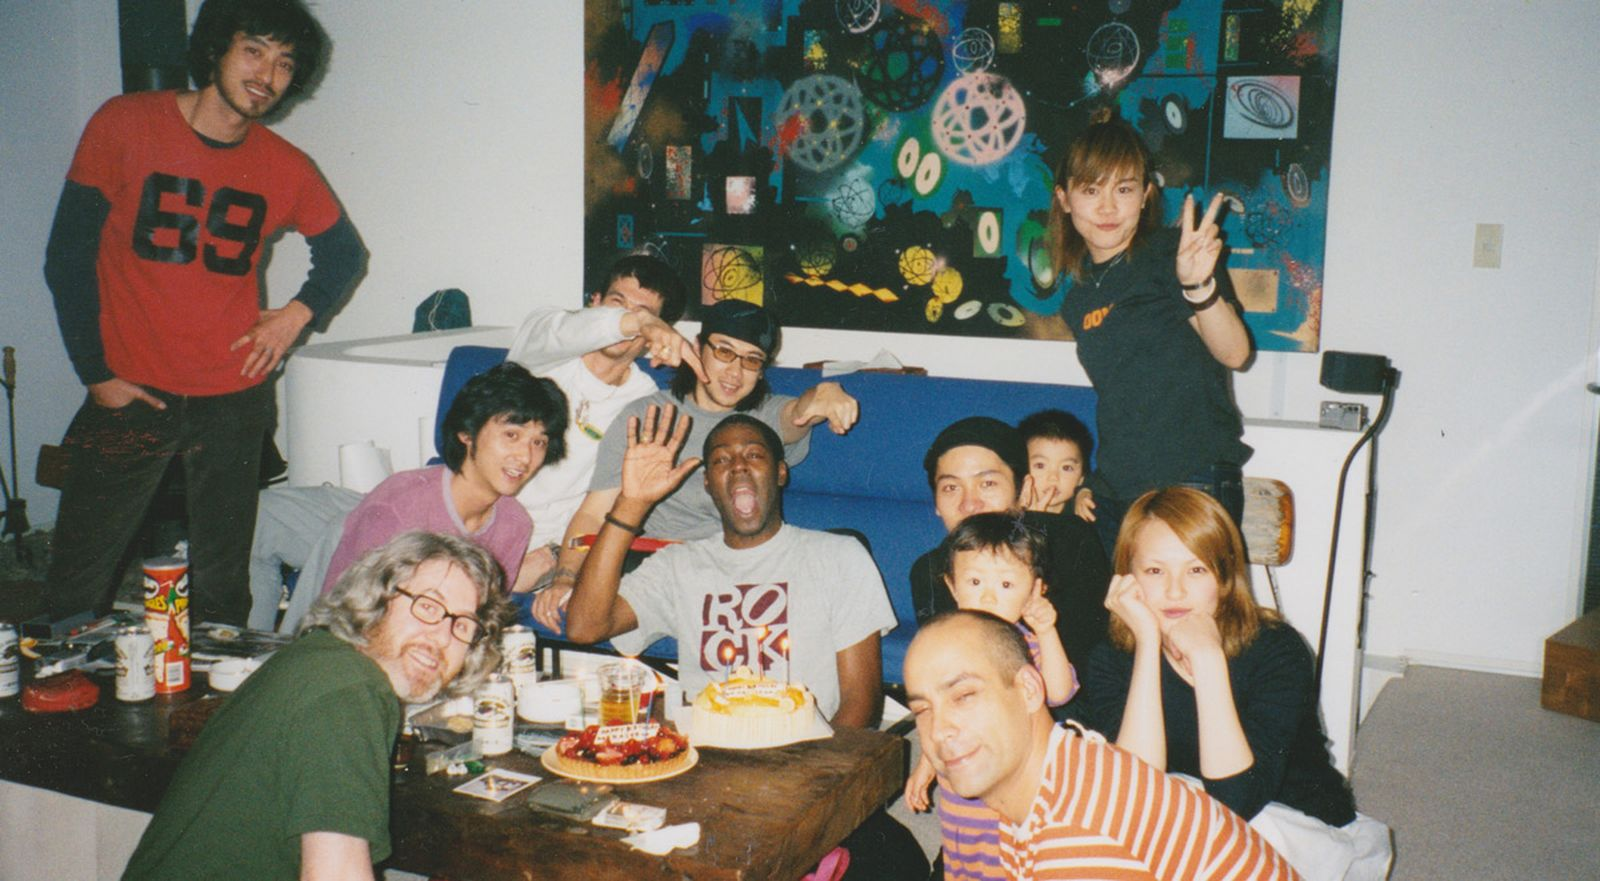 Fraser Cooke, Alex Turnbull, Jun Takahashi Hitomi, James Lebon, trip to Japan